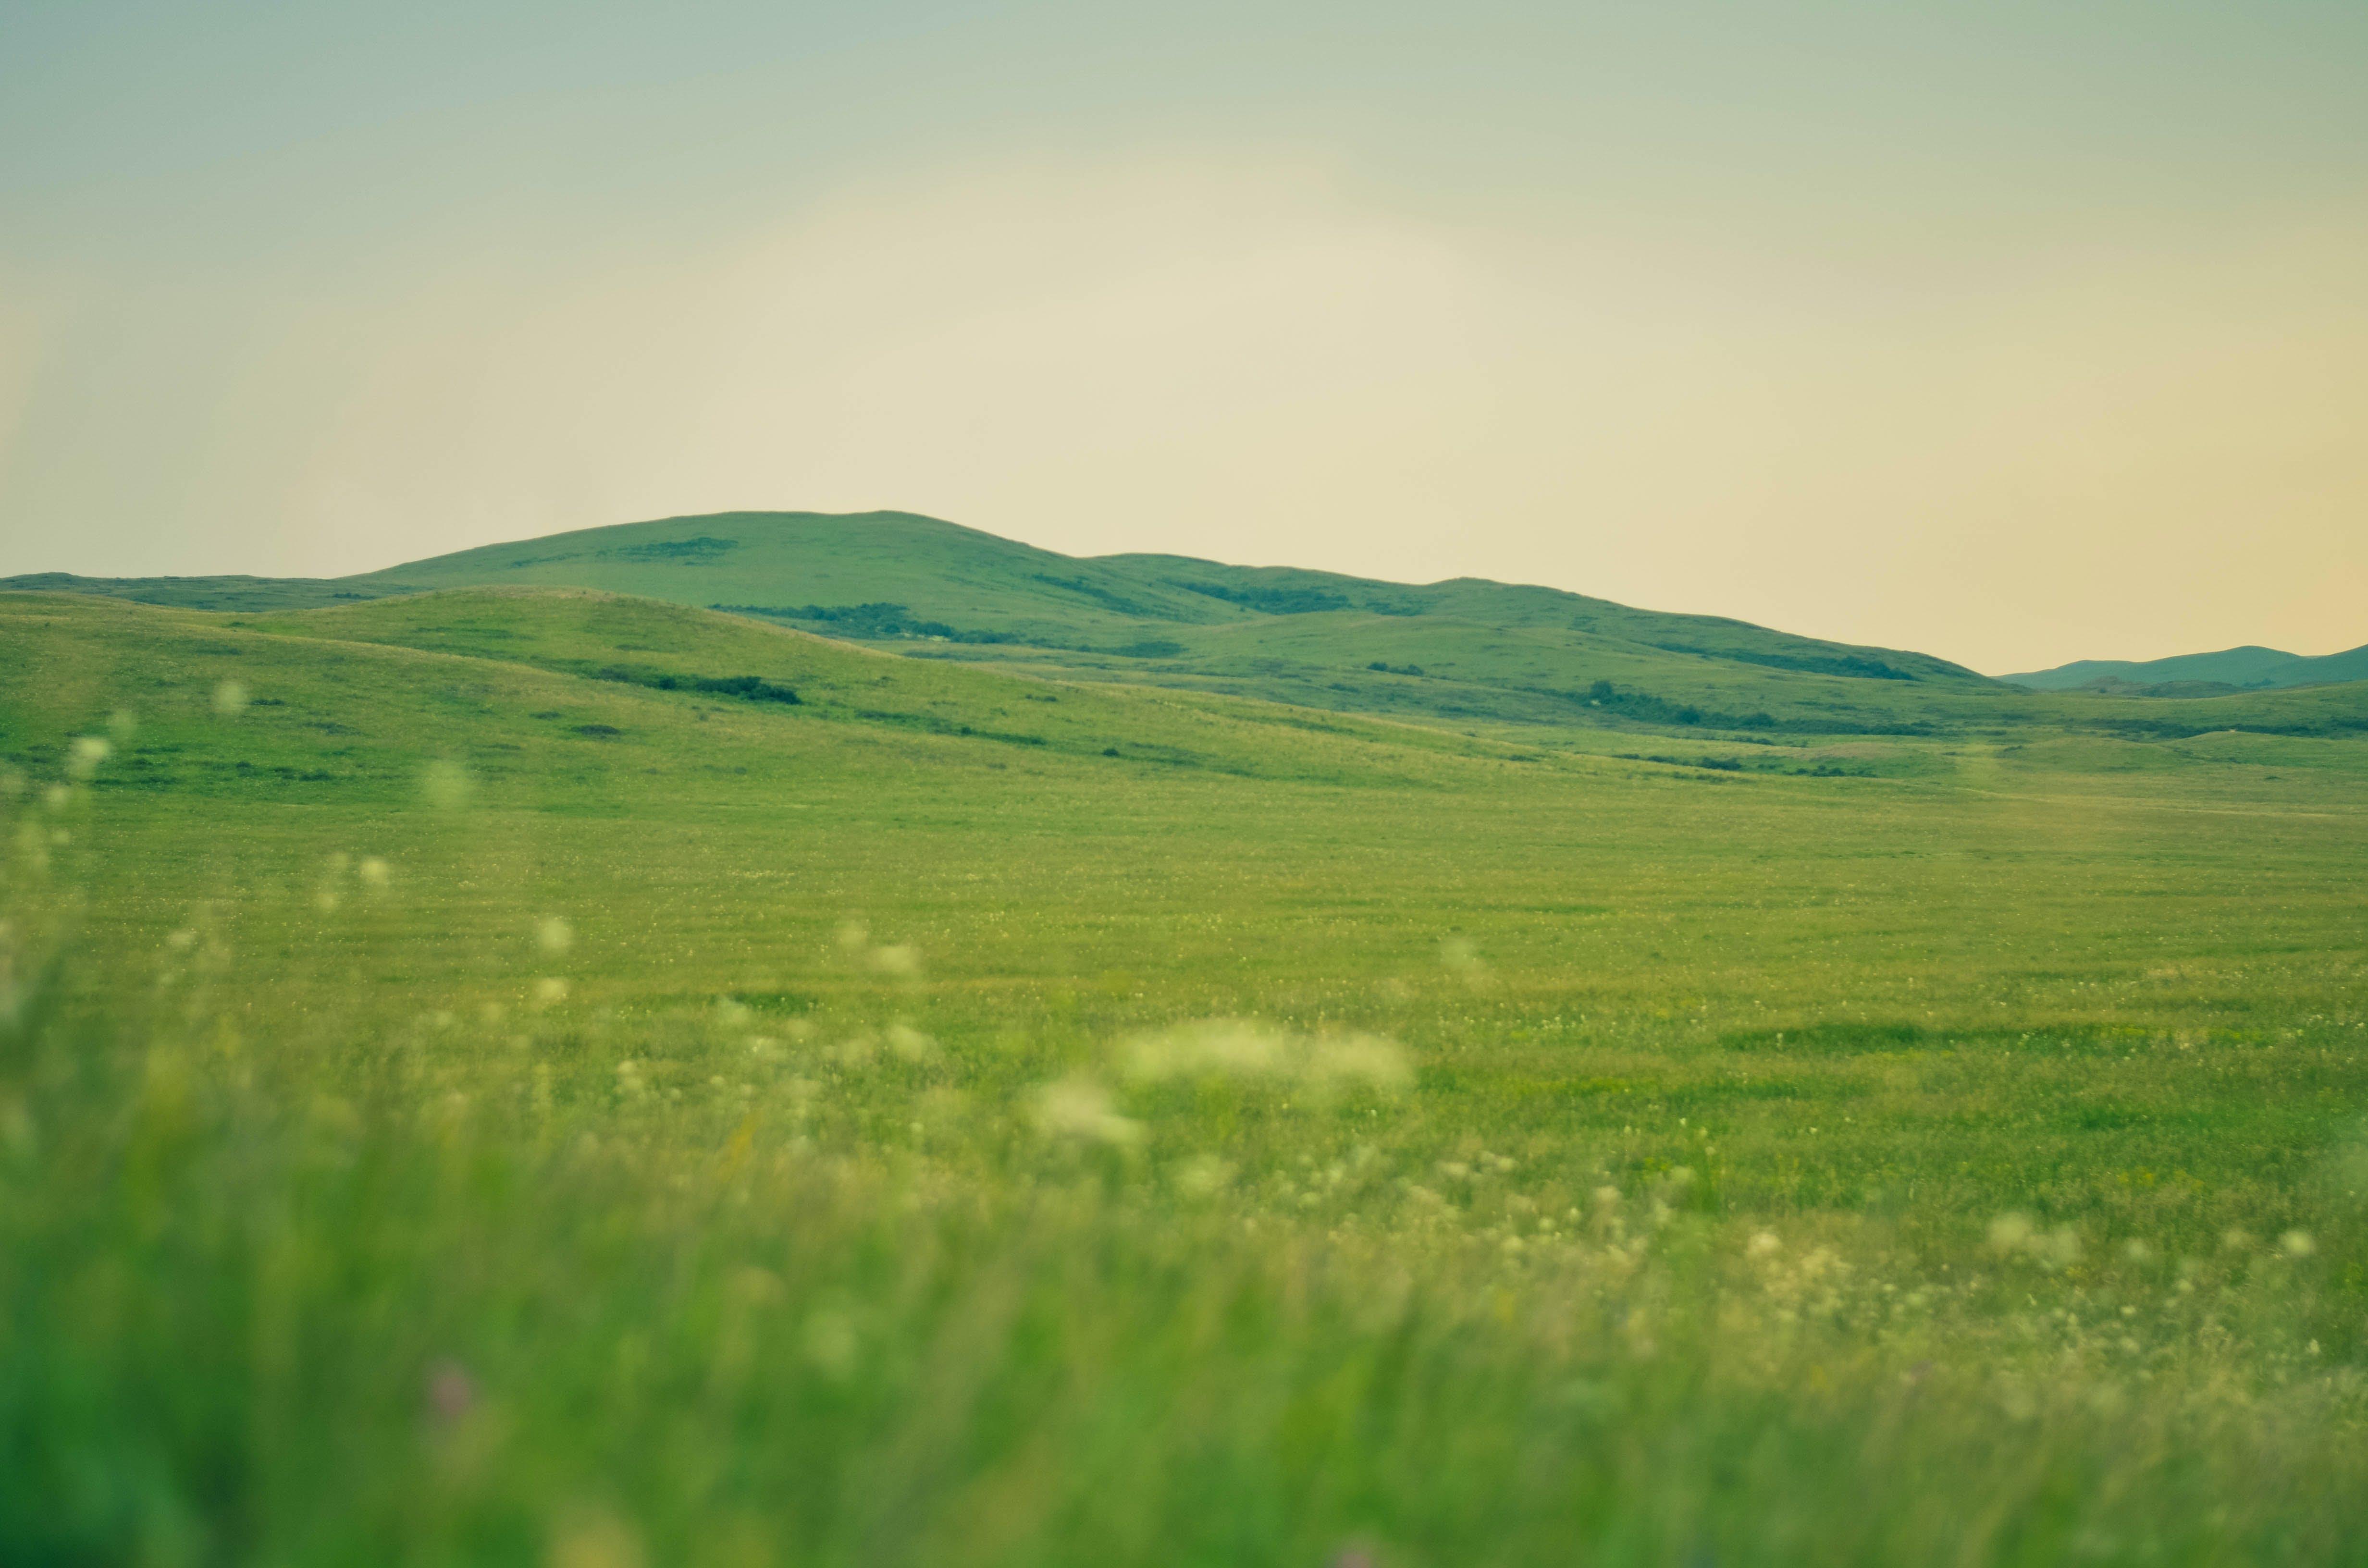 Free stock photo of grass, green, green grass, landscape